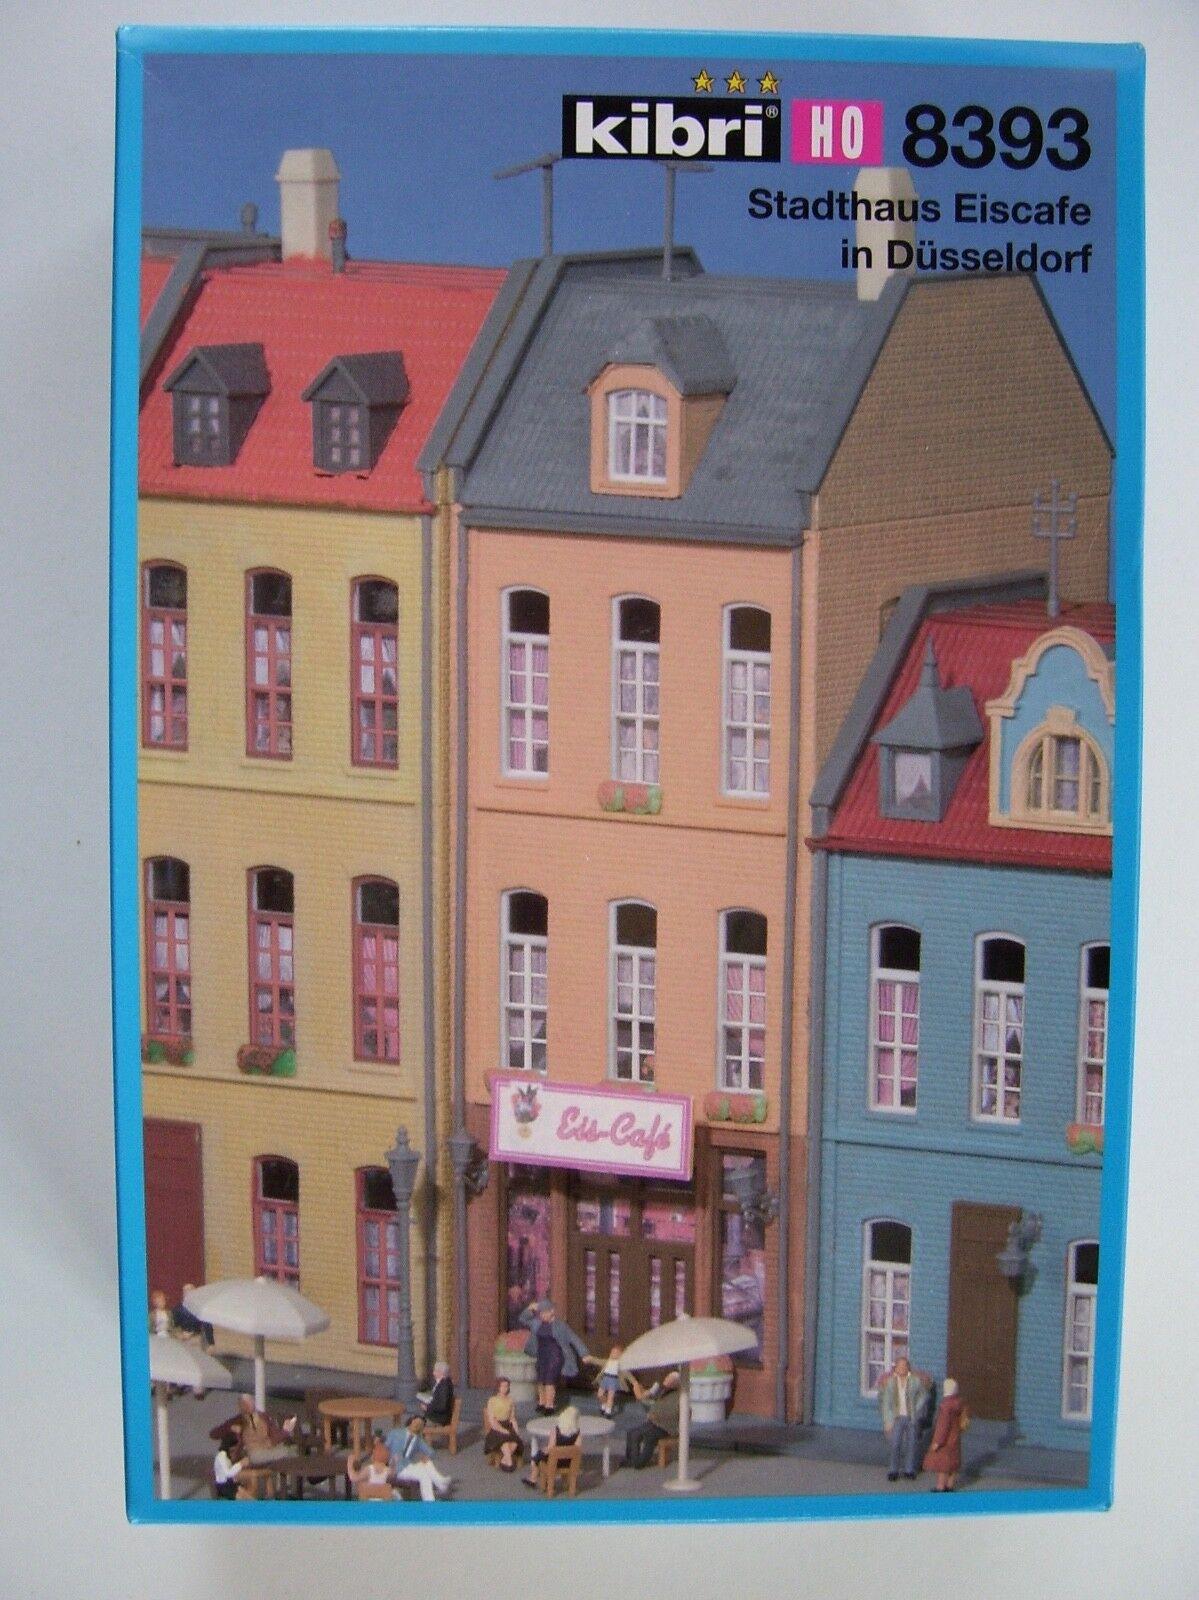 Kibri 8393 HO Scale Stadthaus Eiscafe in Dusseldorf Kit NIB